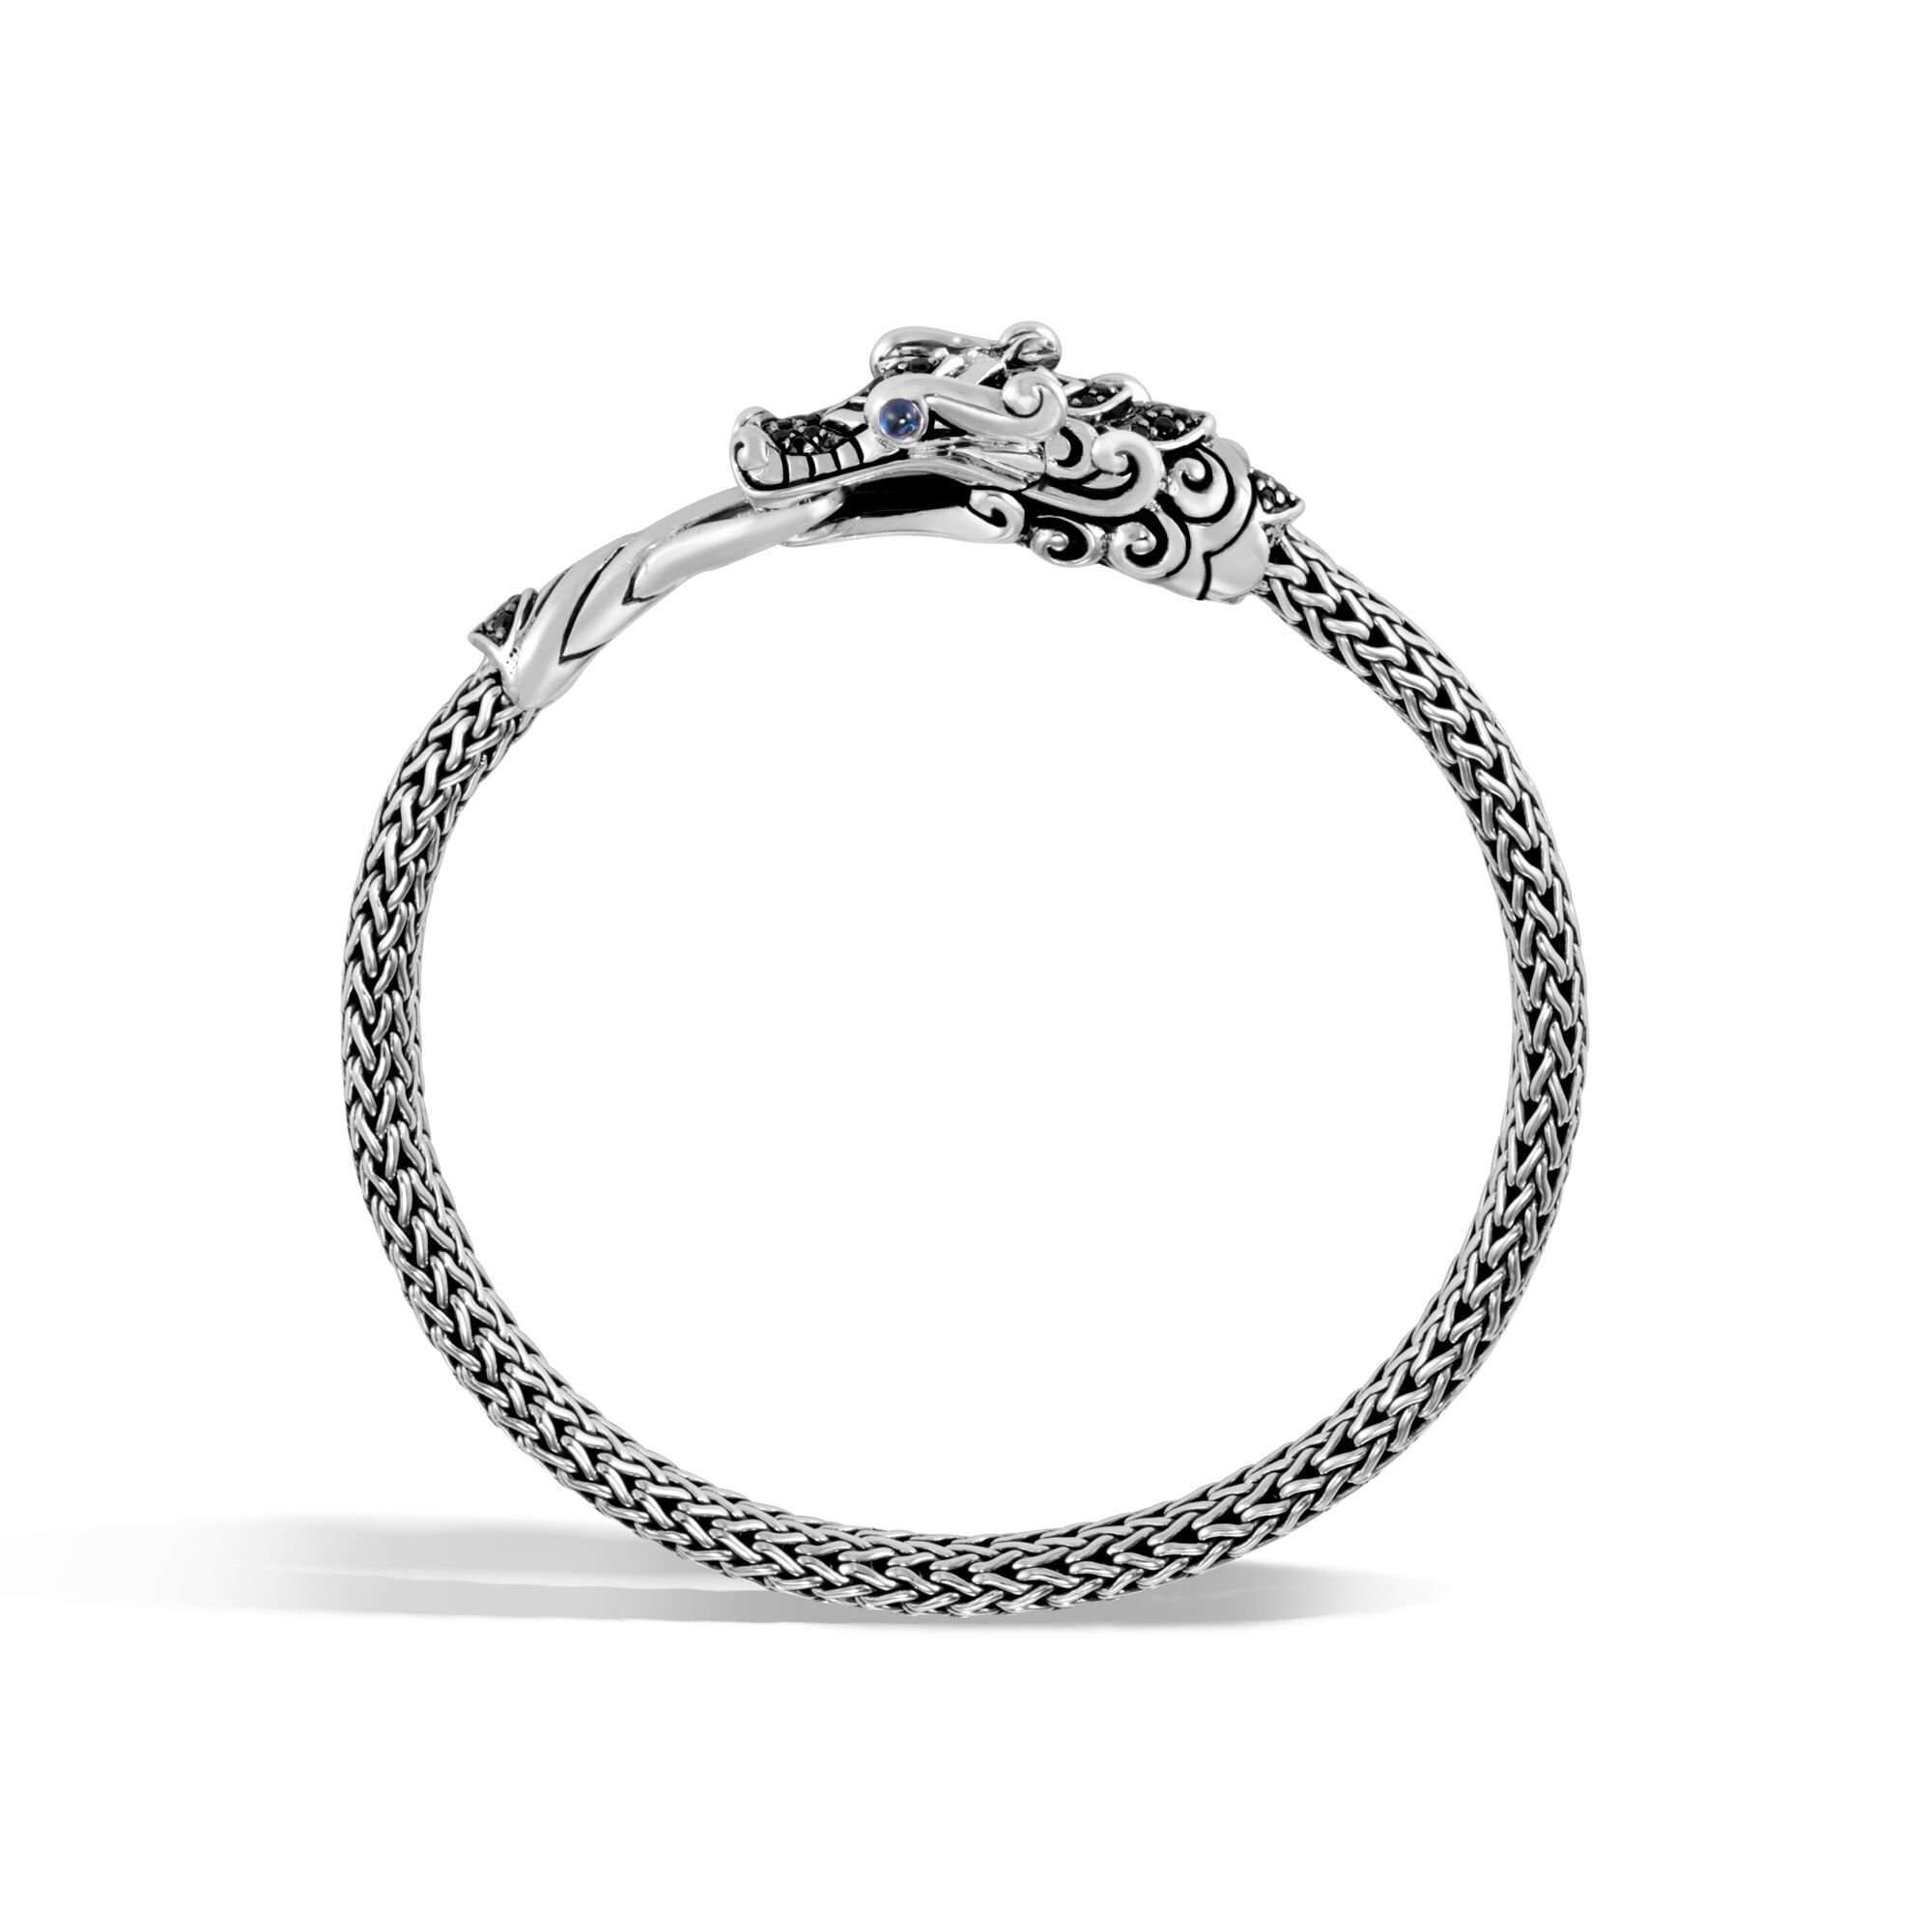 Legends Naga Station Bracelet in Silver , Treated Black Sapphire, large